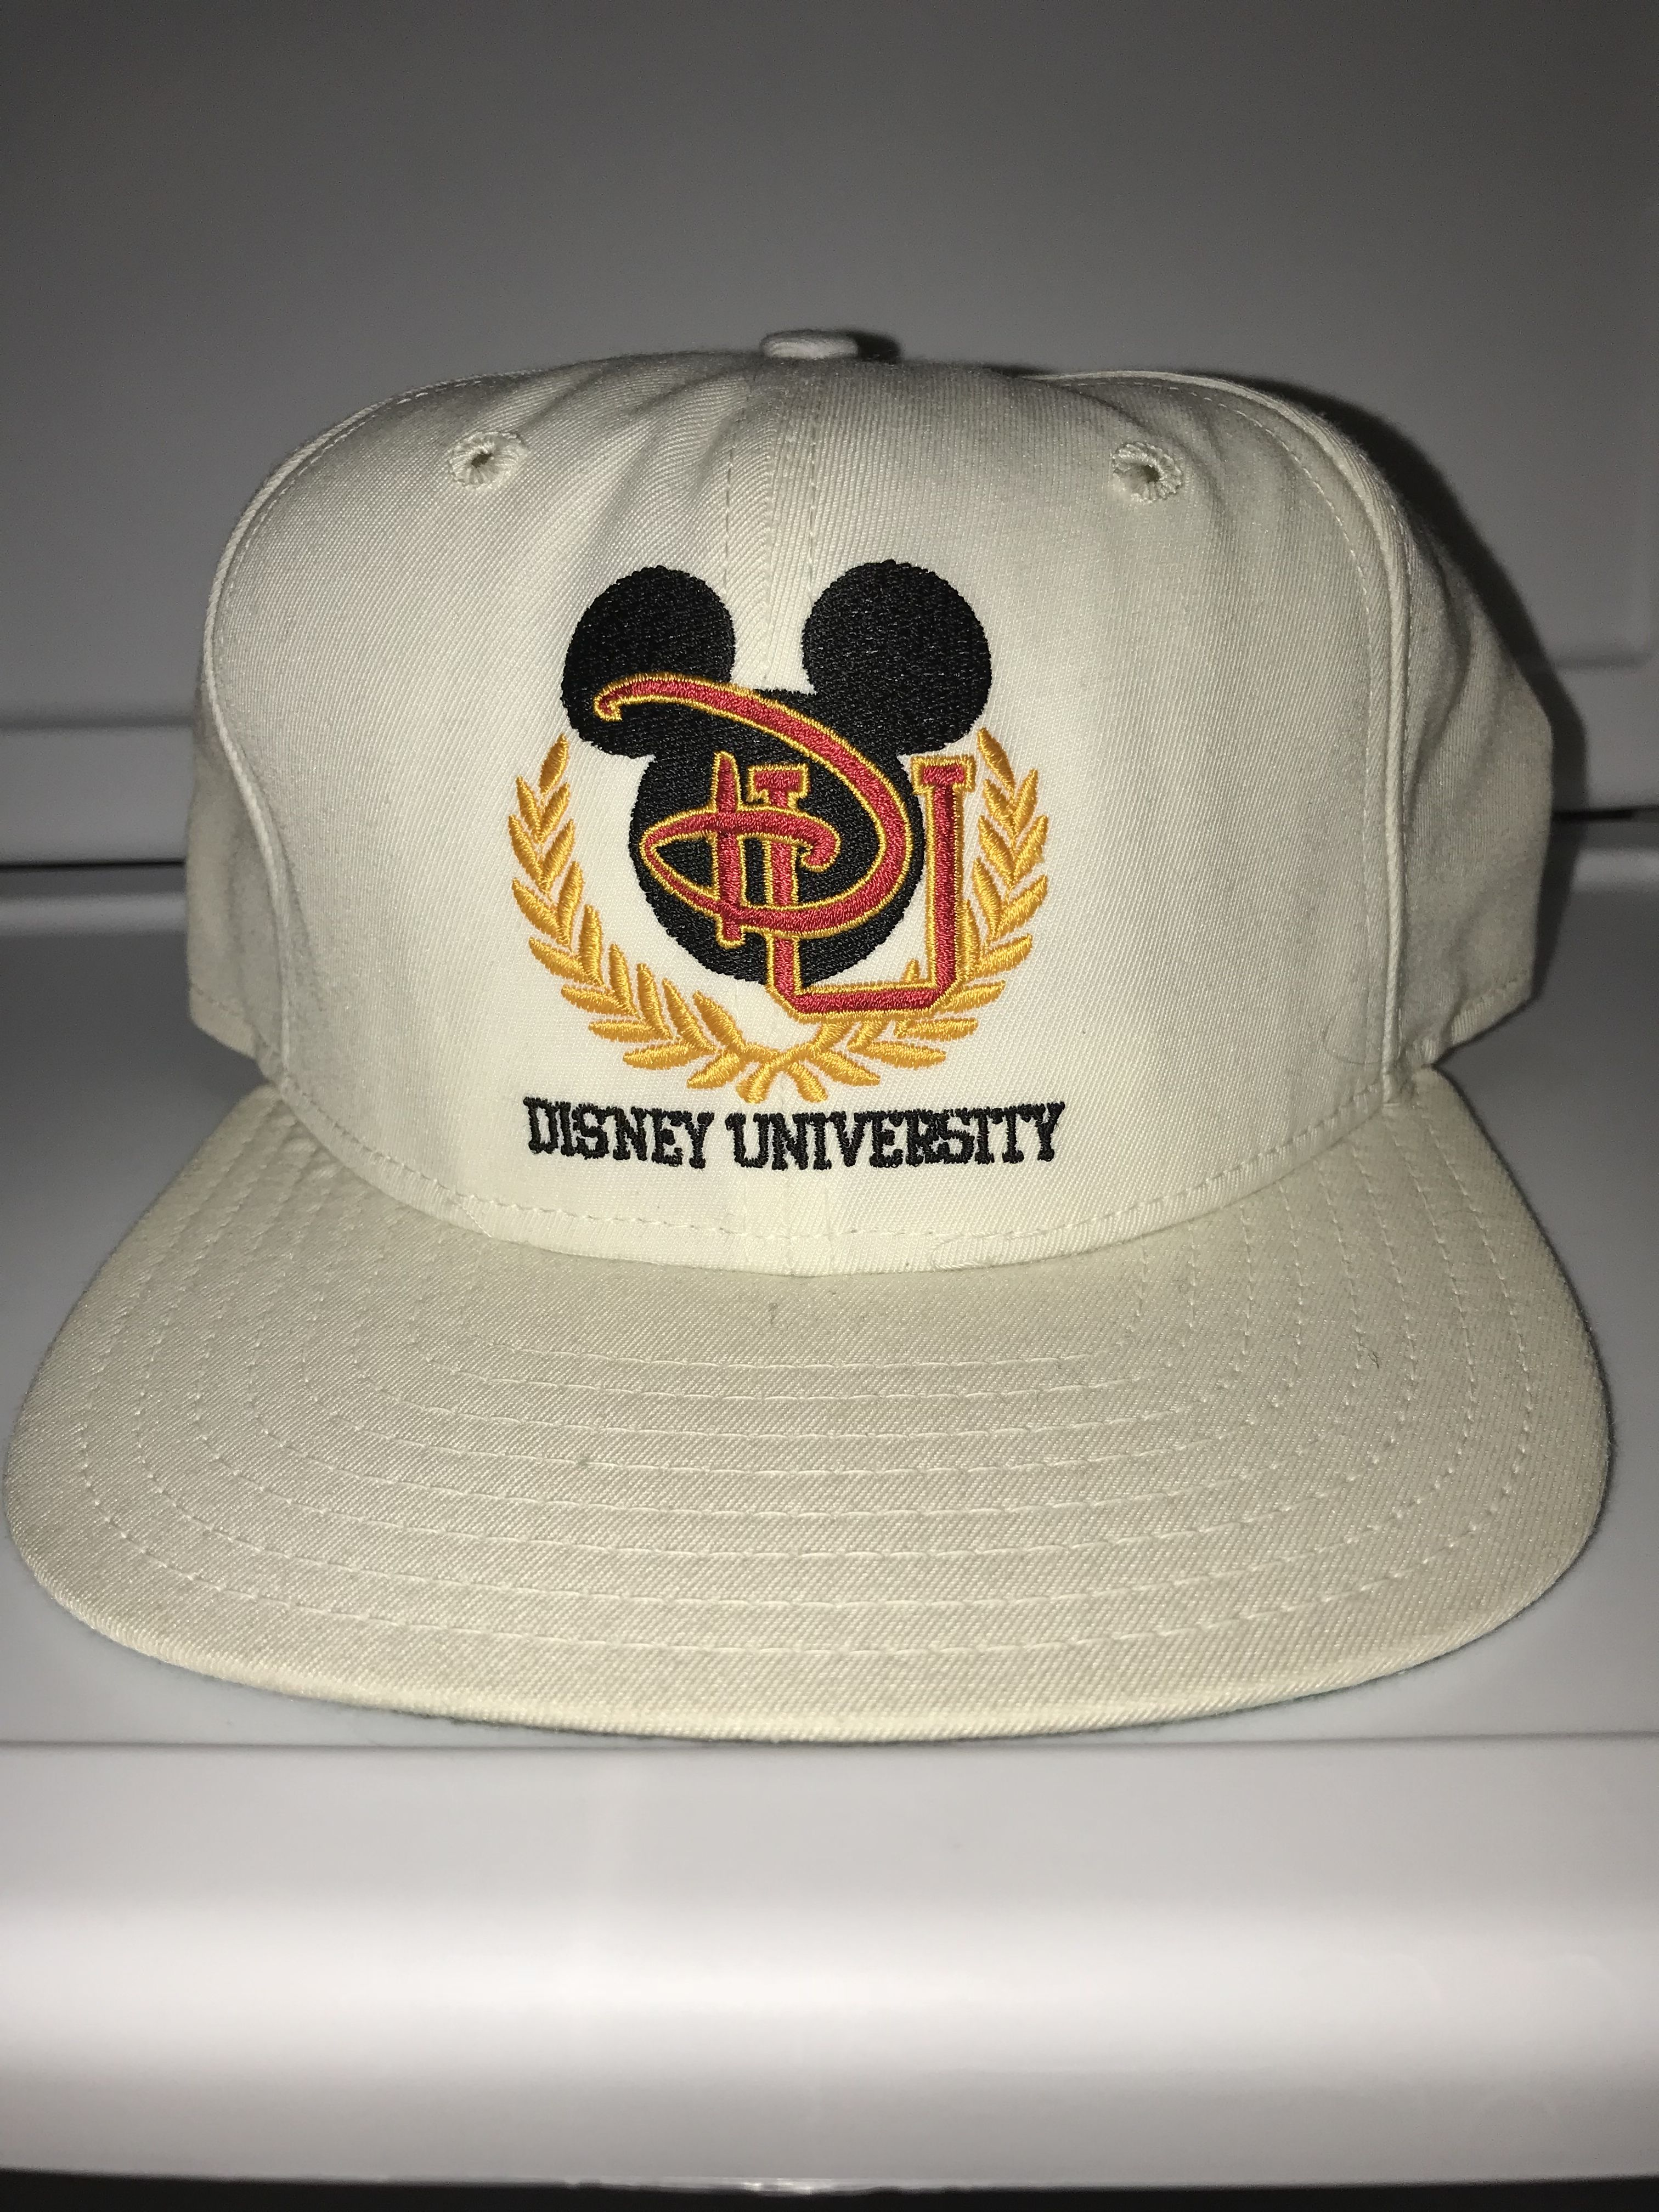 AP.Room Oingo Boingo Adult Cap Adjustable Cowboys Hats Baseball Cap Adjustable Athletic Hat